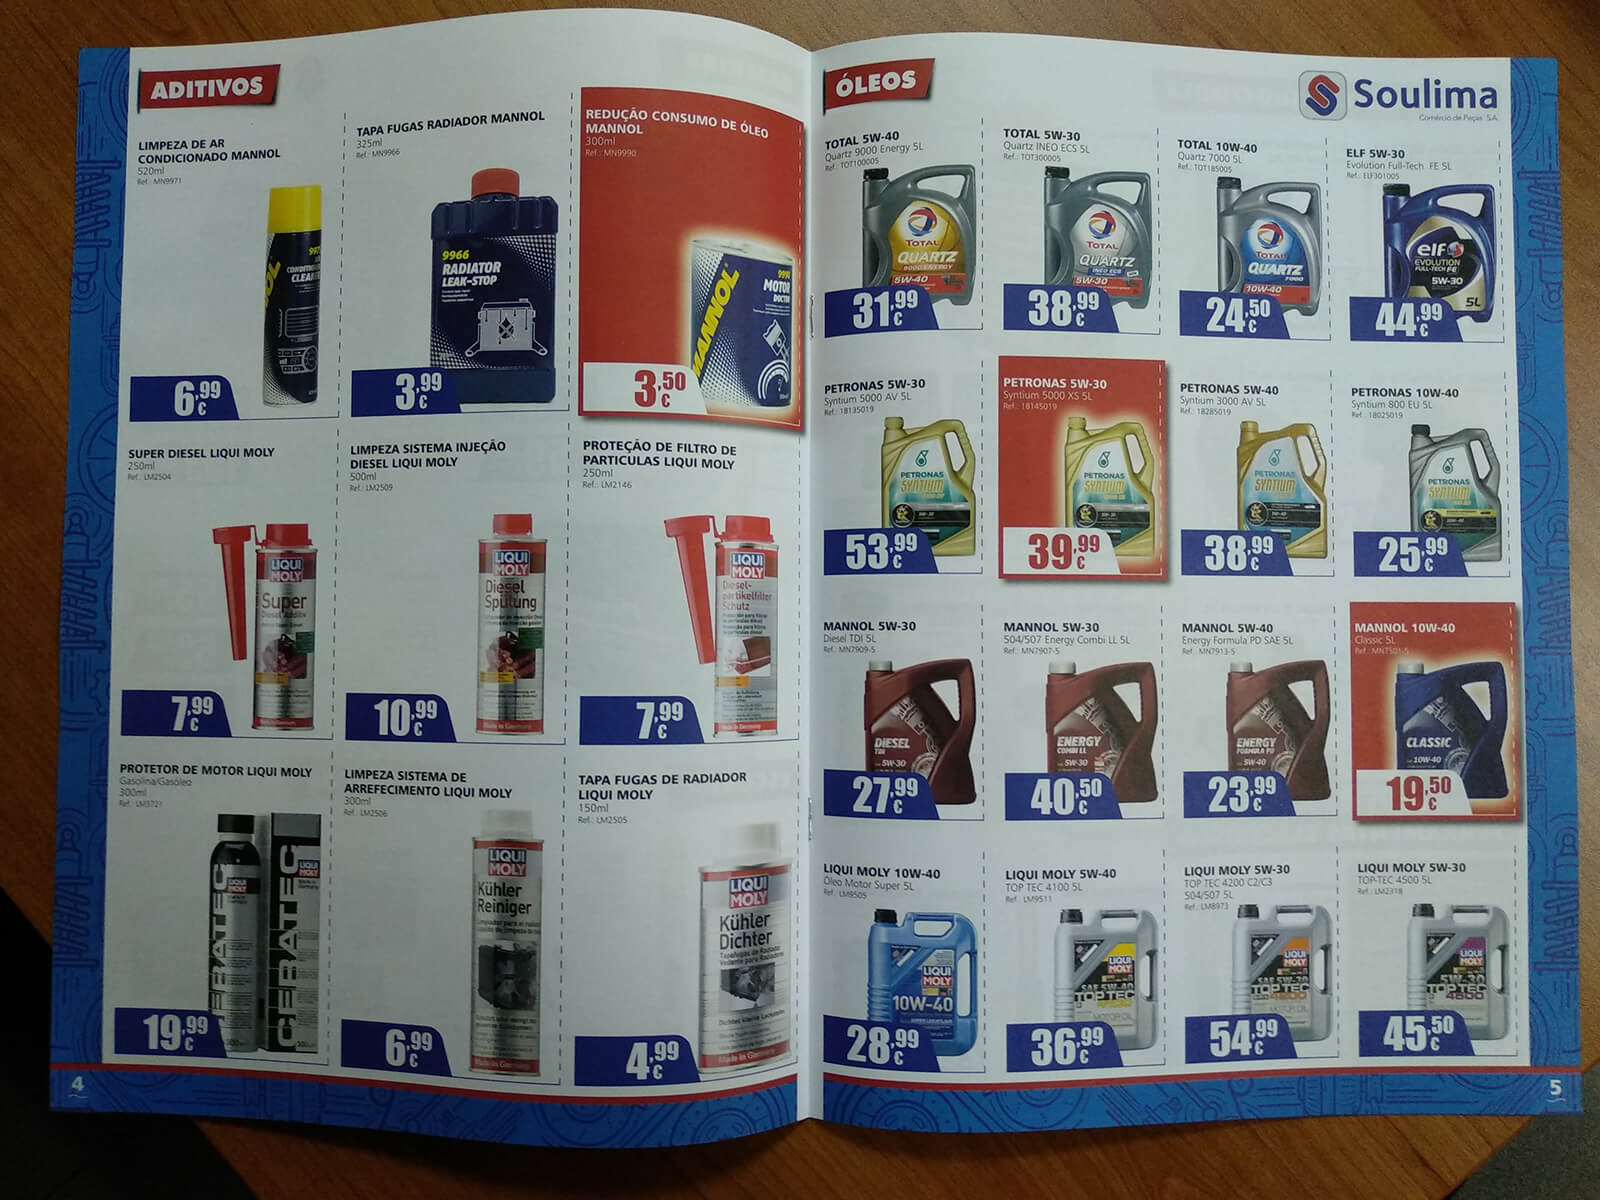 Soulima - Comércio de Peças - Printed Brochure Soulima - Interior | Way2Start - Design & Digital Agency